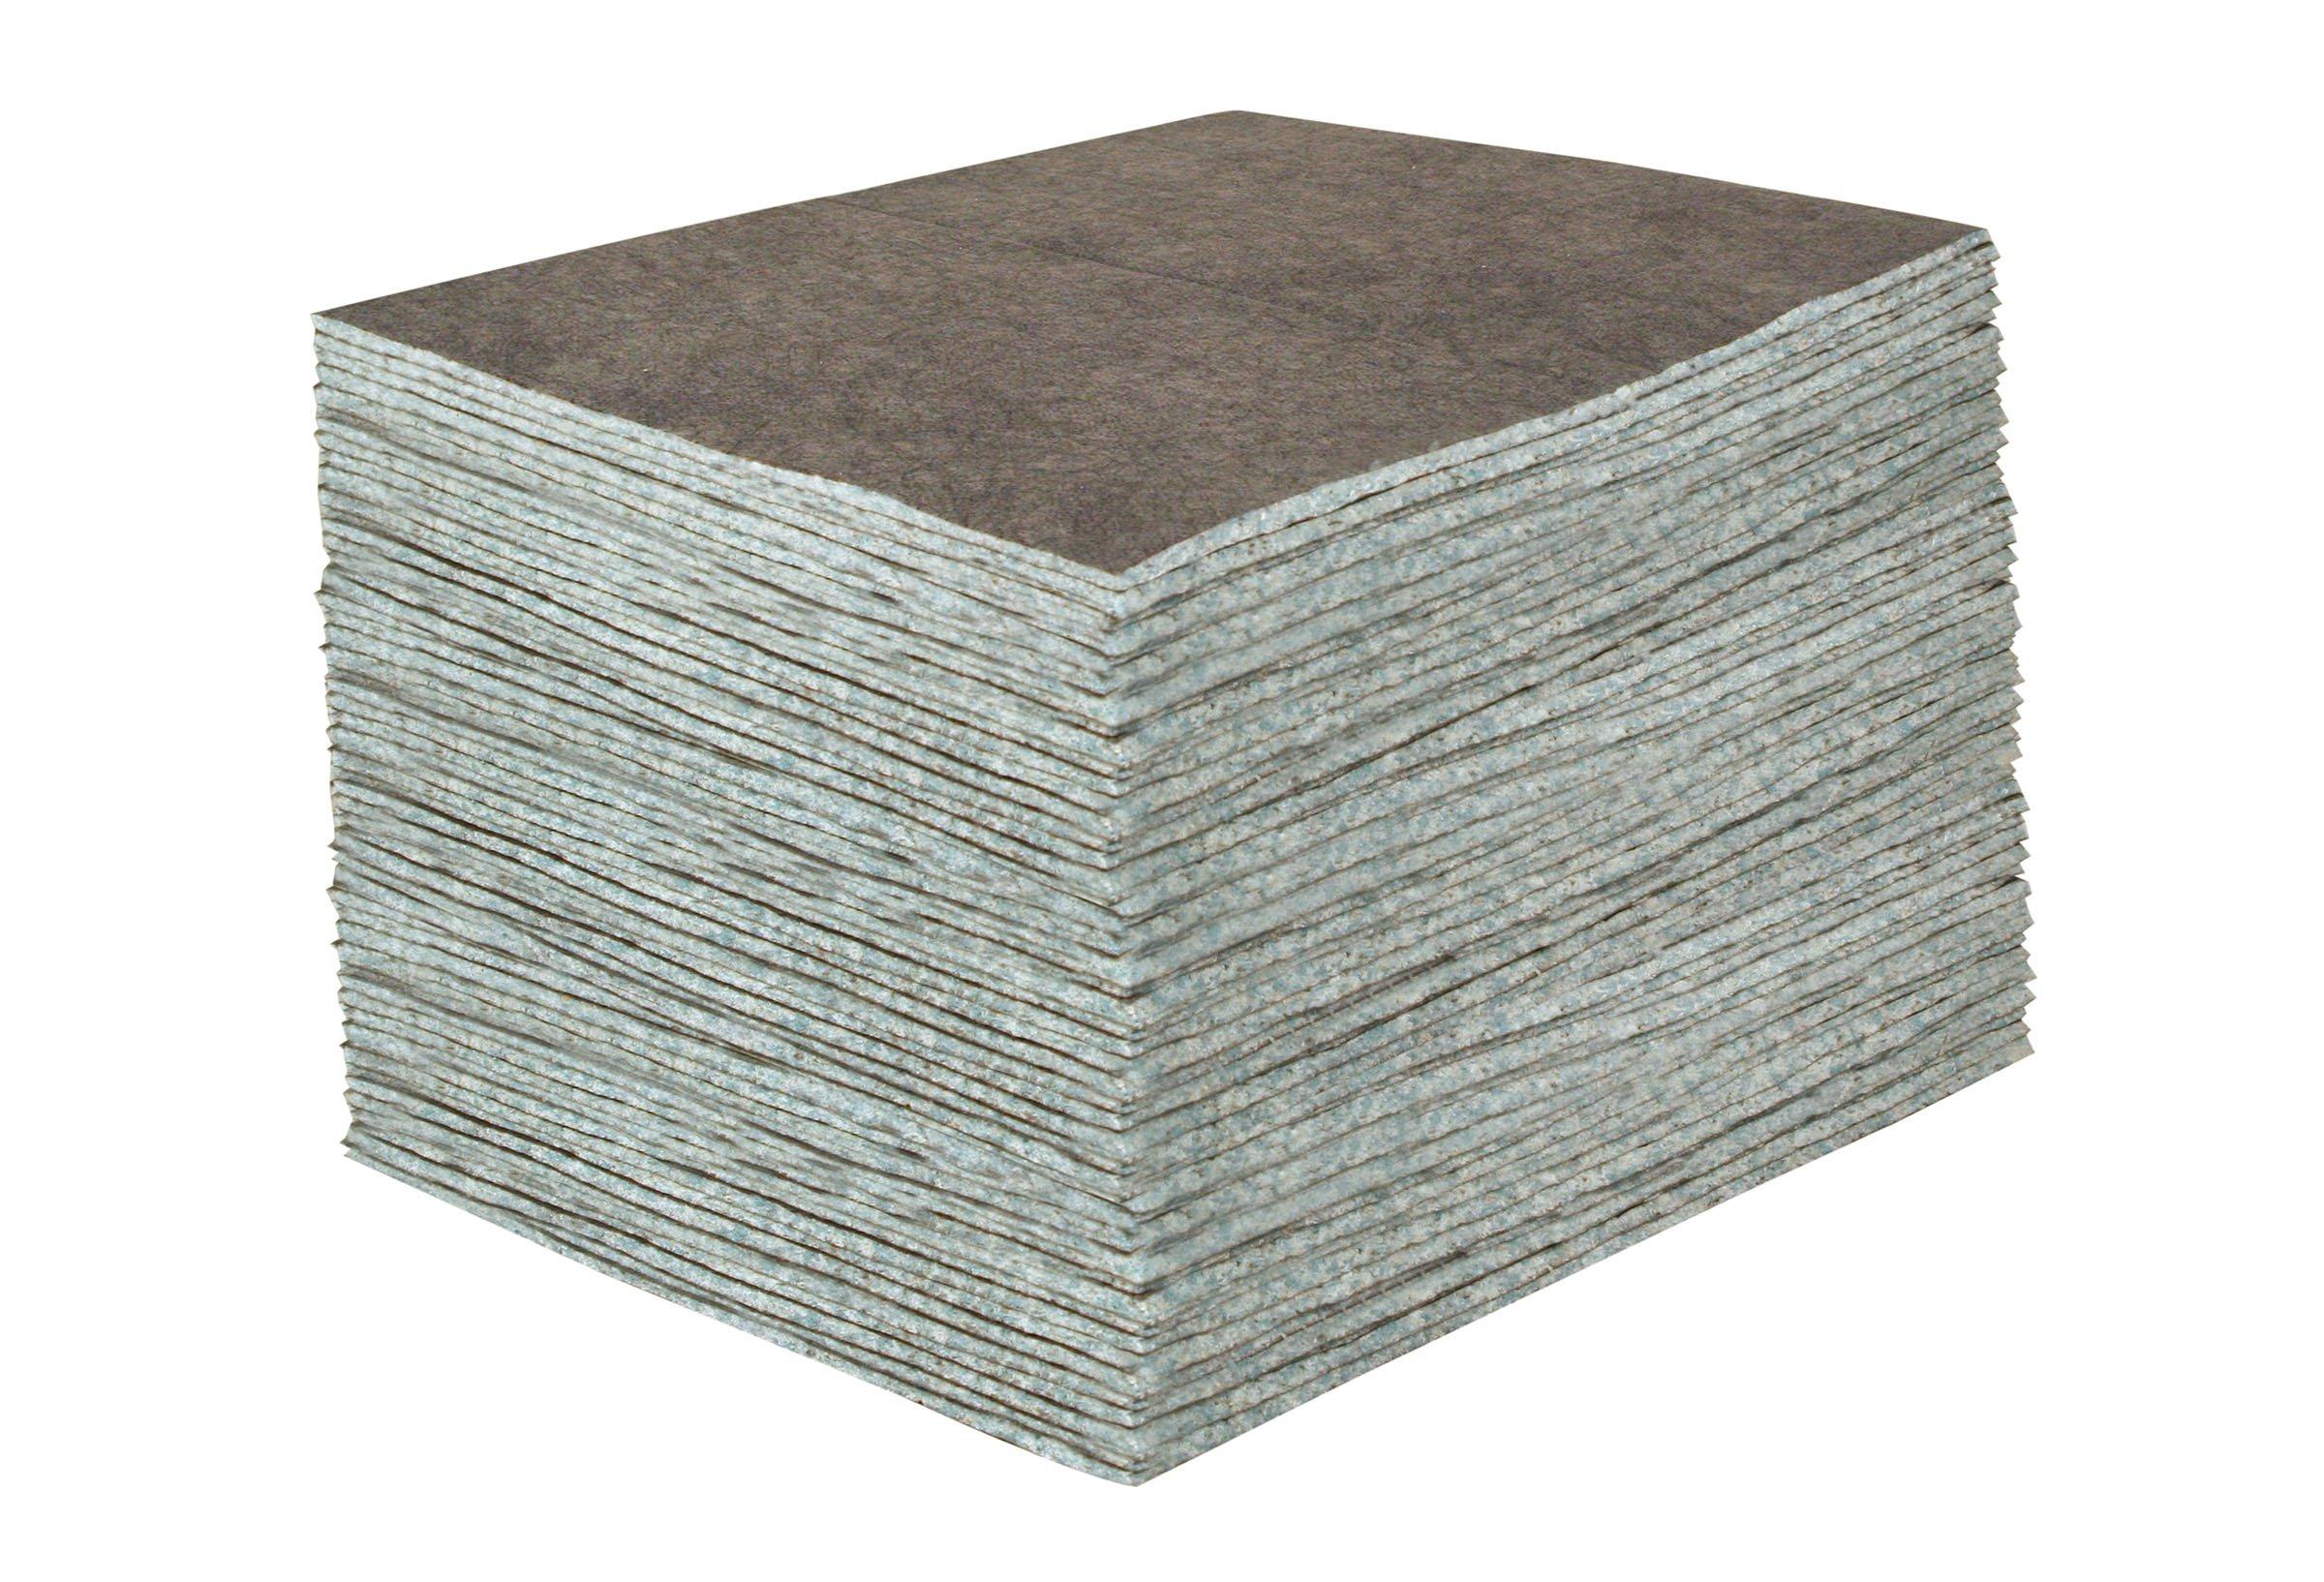 Sellars 23200 ToolBox DuraSoak Fiber Medium Duty General Purpose Absorbent Pad, 30.3 Gallon Absorbancy, 19'' Length x 15'' Width, Gray (Case of 100)